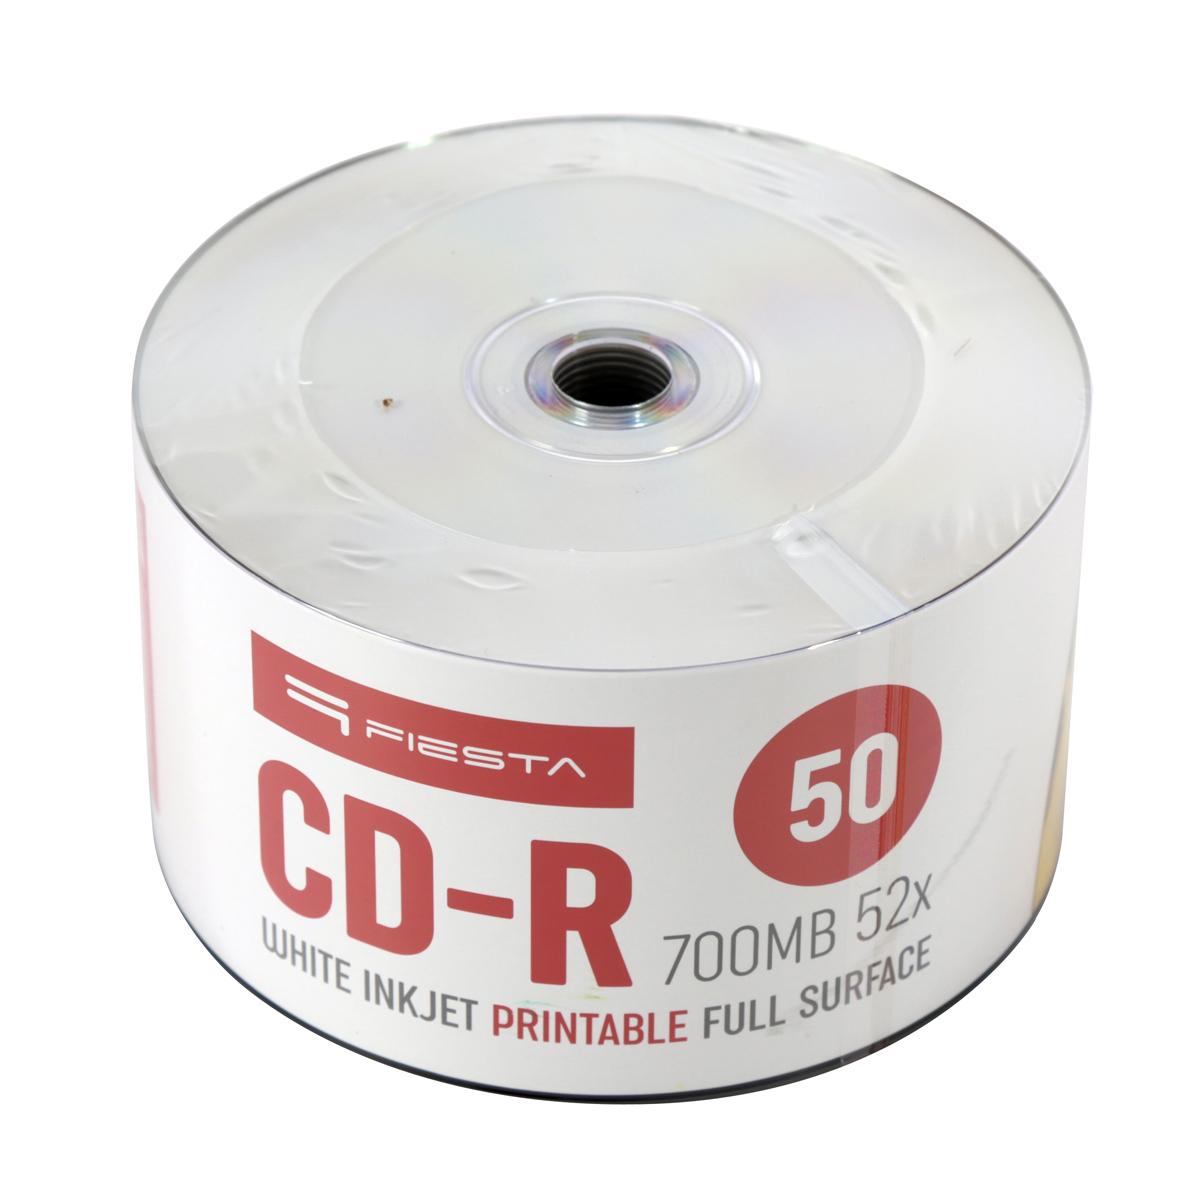 CD-R FIESTA  700MB 52X FF WHITE INKJET PRINTABLE SP оп. 50бр.